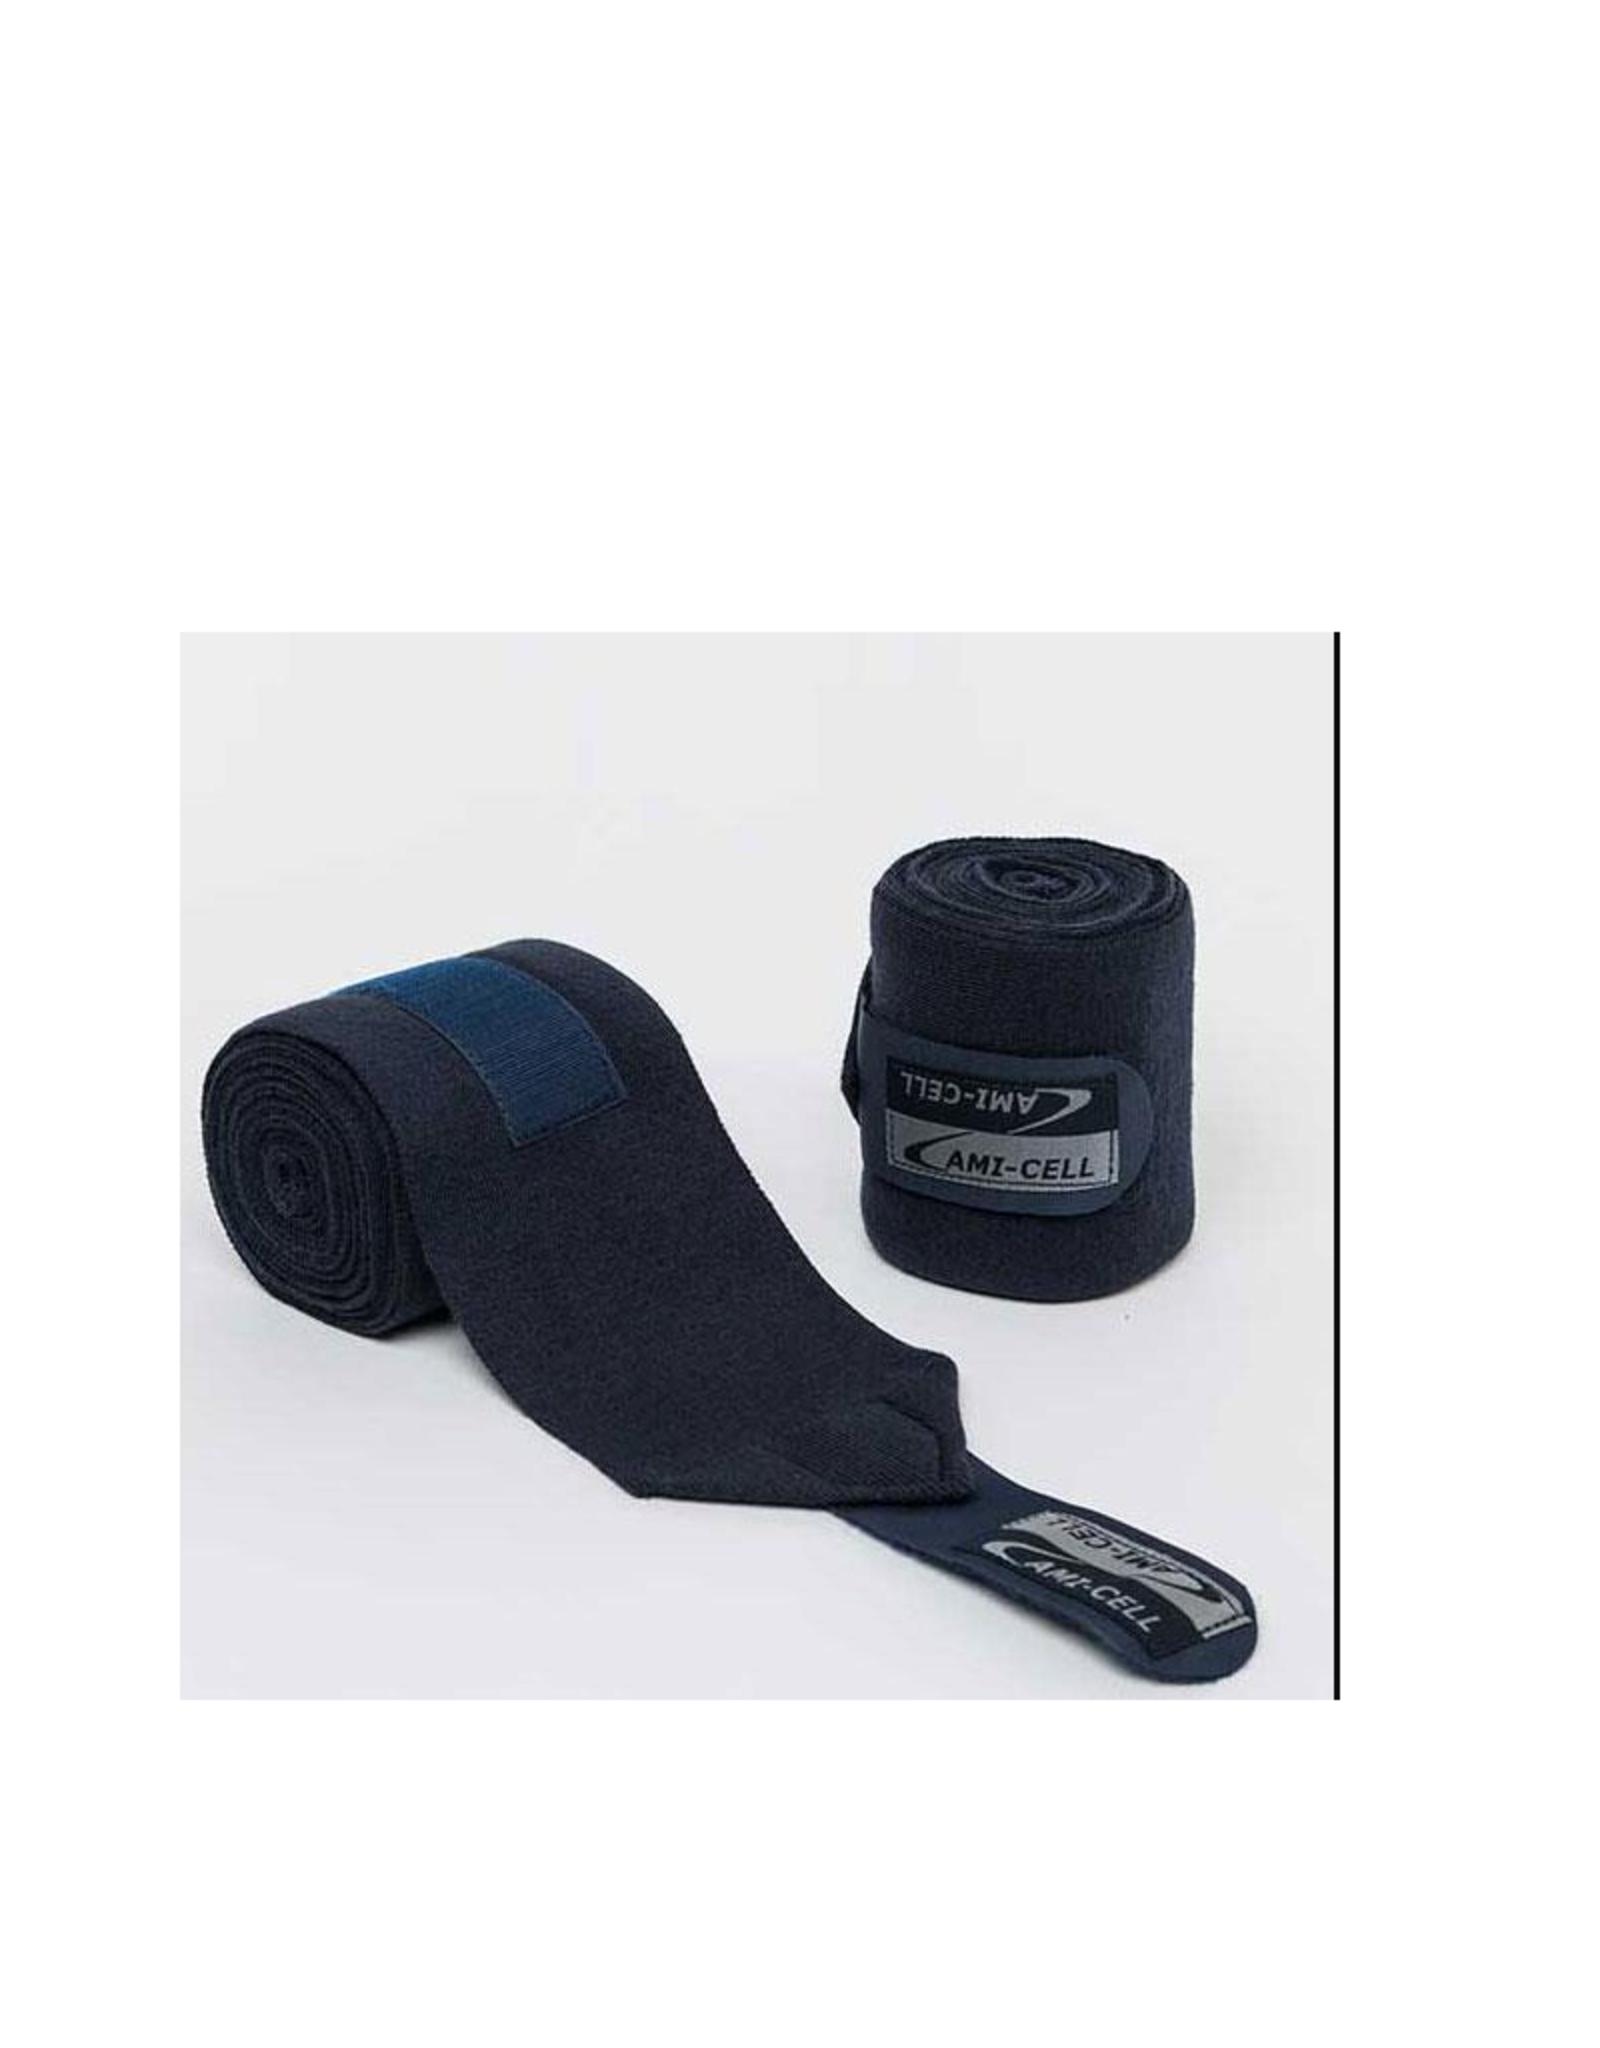 Lami-Cell Lami-Cell Rust bandage (4 stuks)